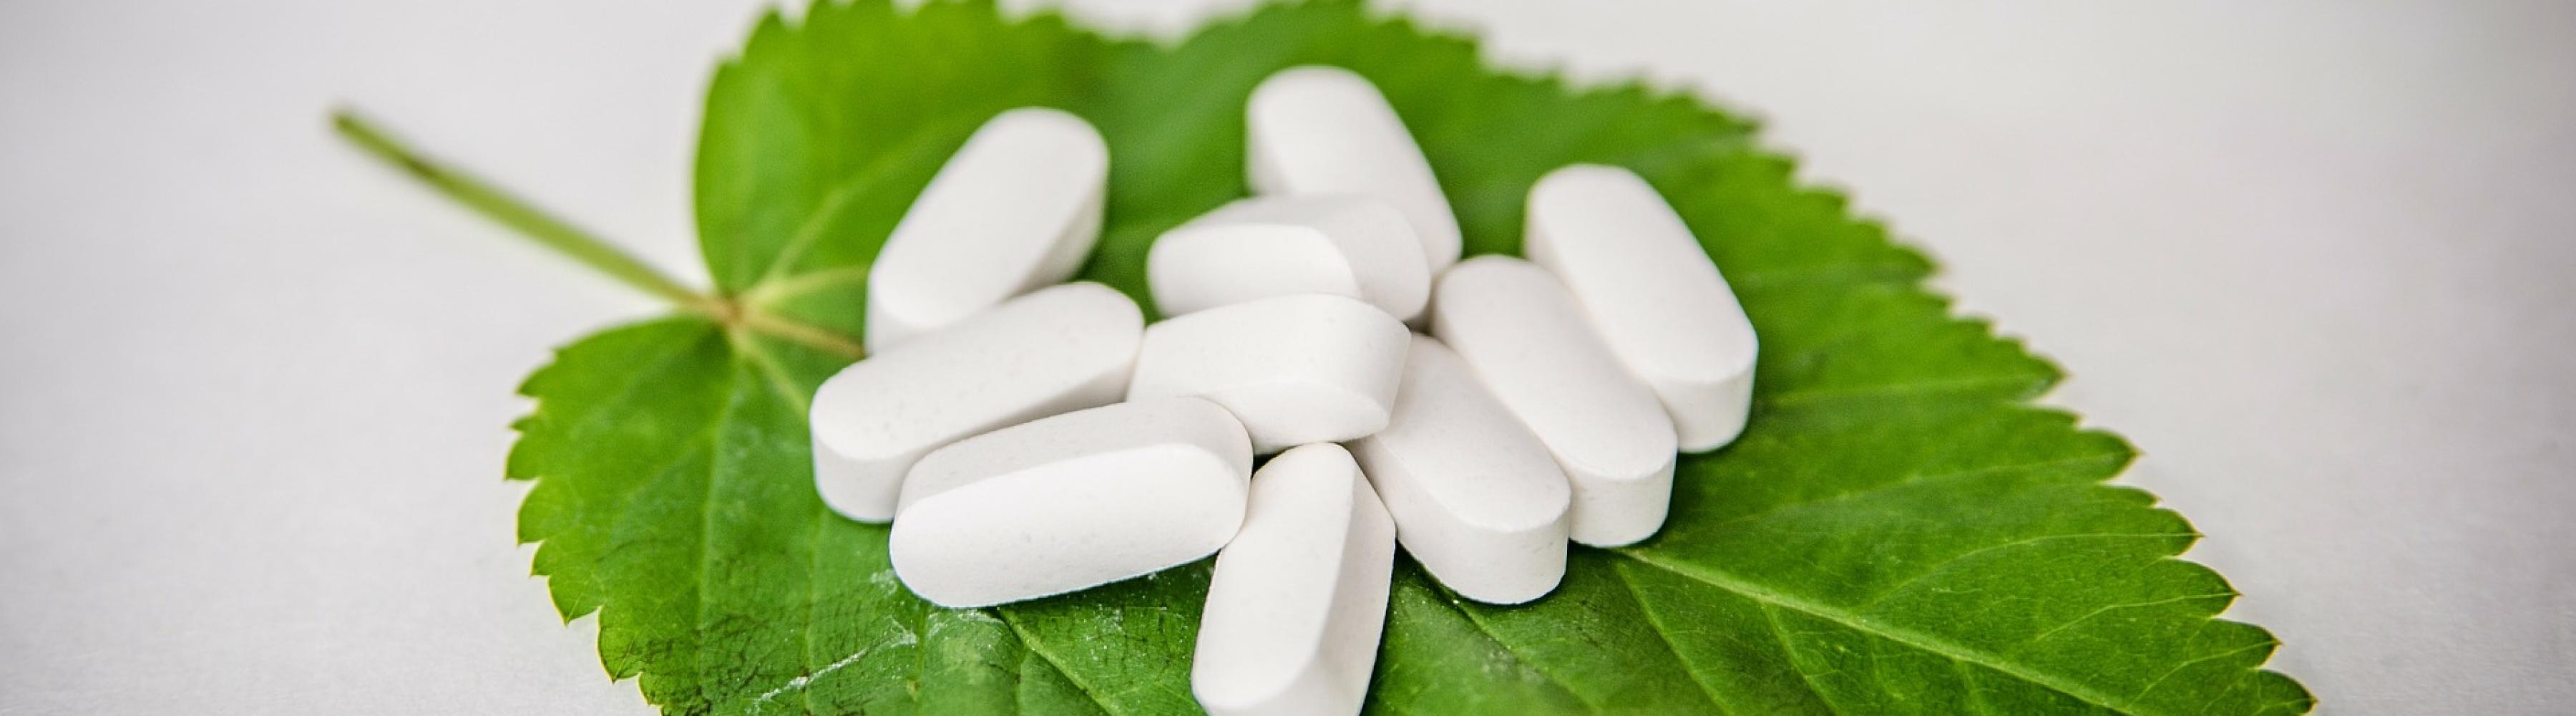 slider-farmacia-matute-cadiz-5